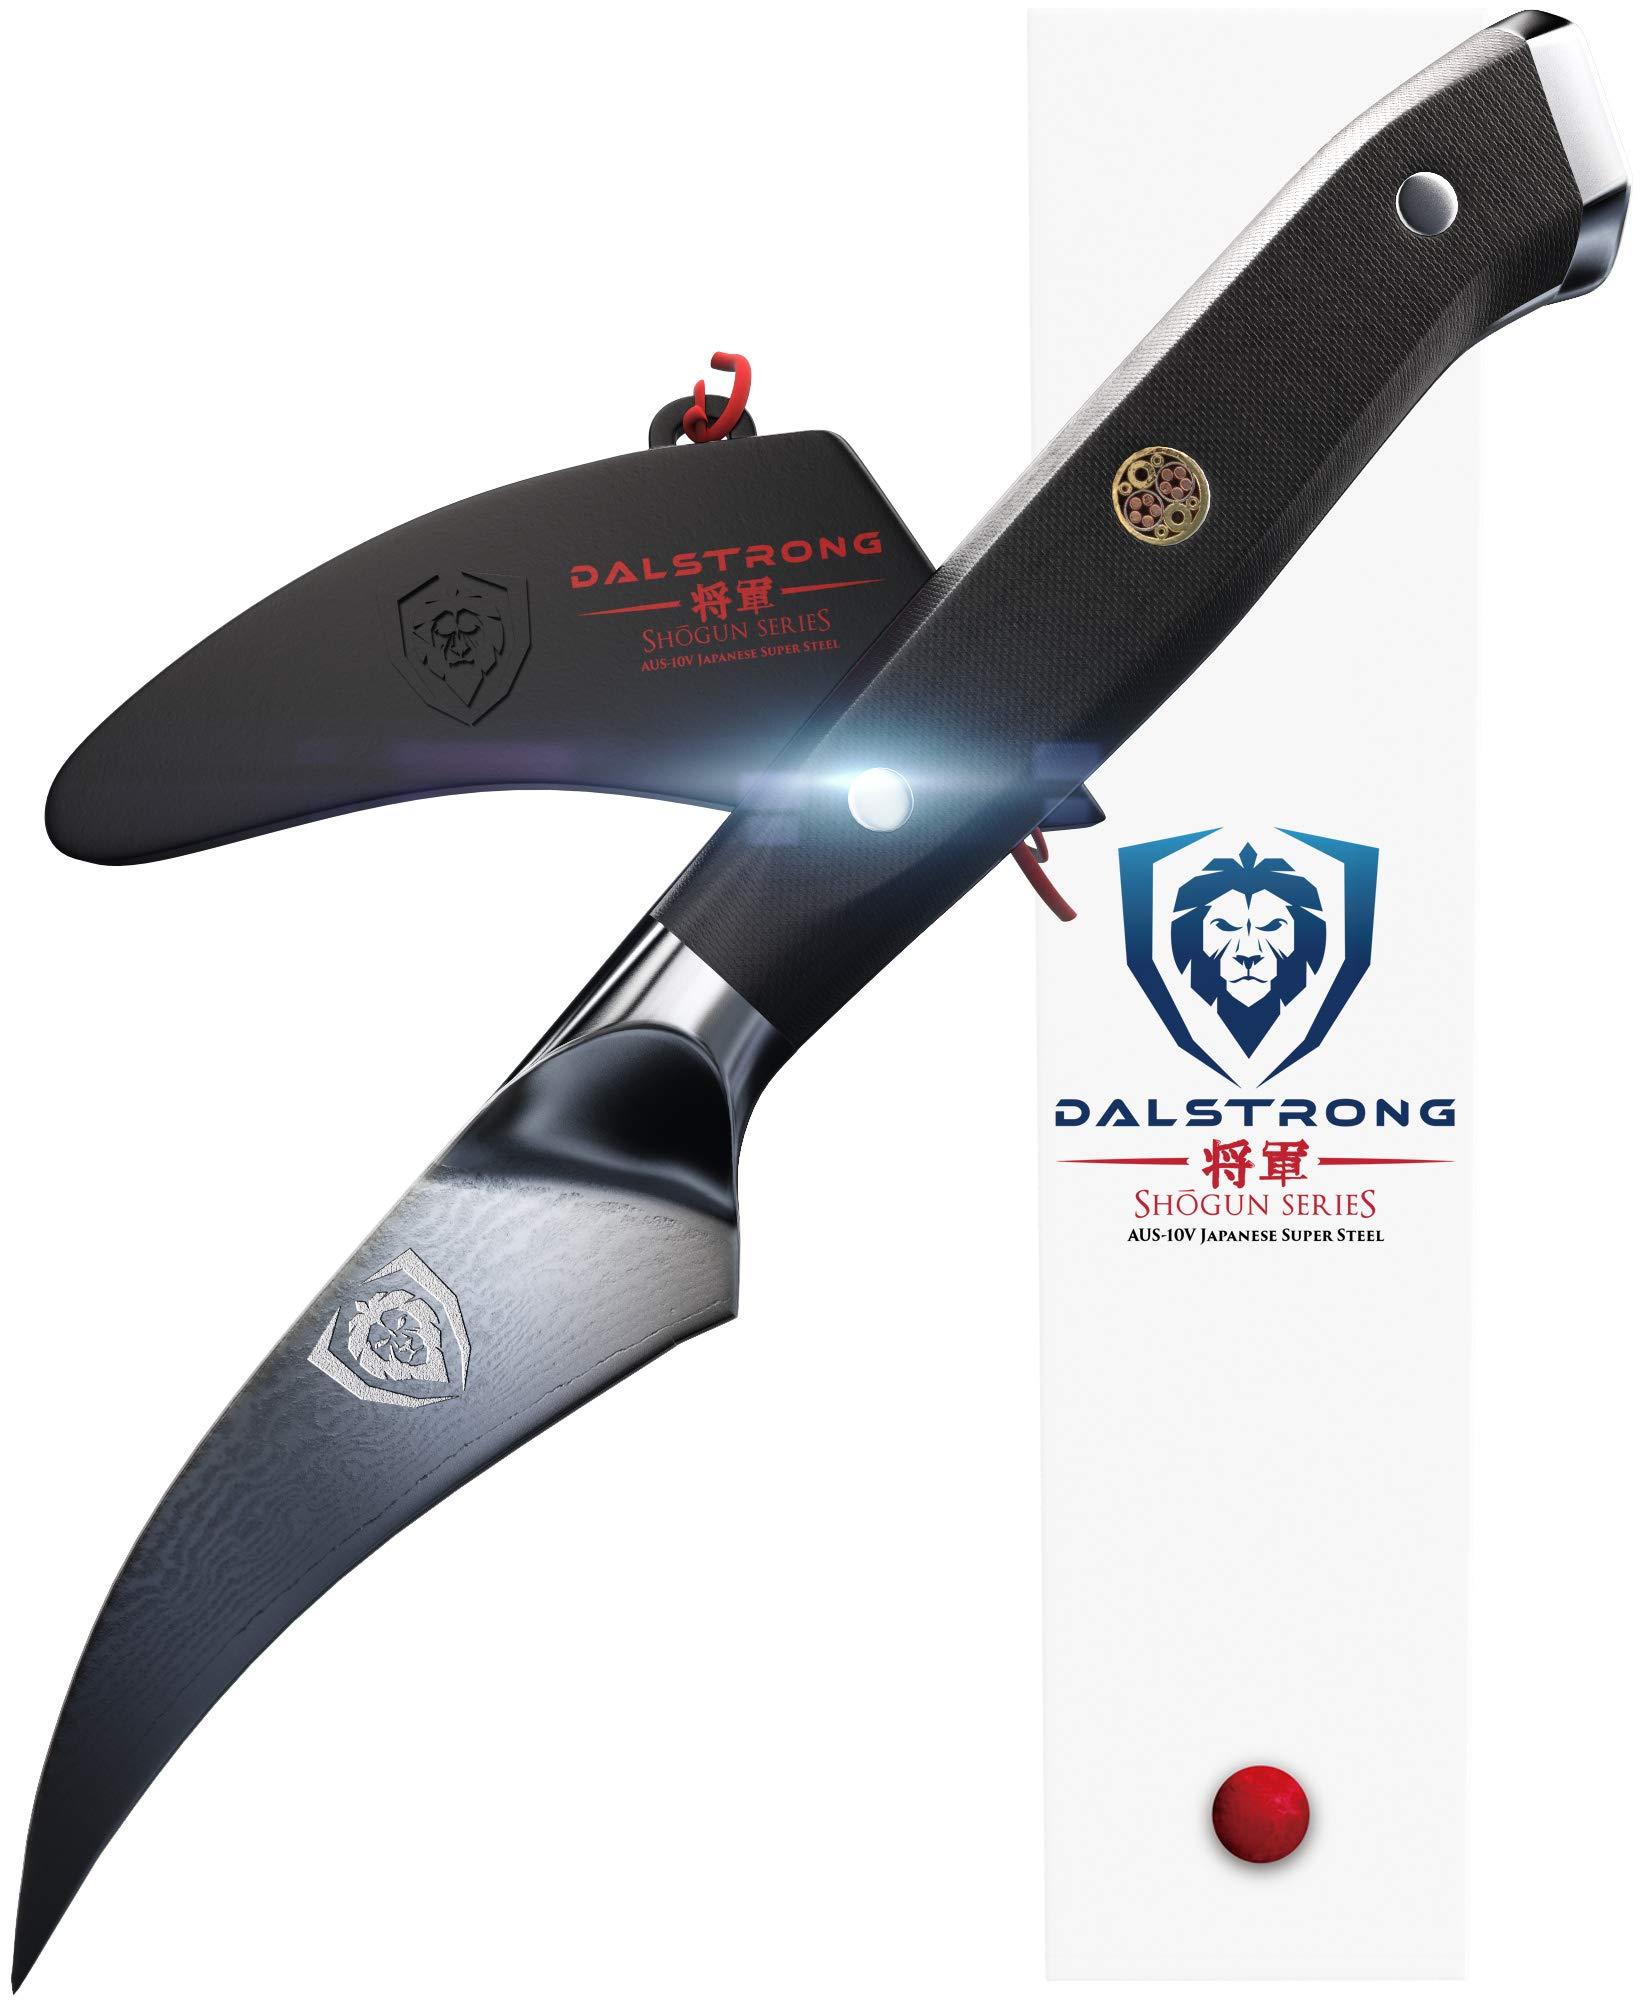 DALSTRONG Bird's Beak Paring Peeling Tourne Knife - Shogun Series - Damascus - Japanese AUS-10V Super Steel - Vacuum Heat Treated - 3'' Peeler - Guard by Dalstrong